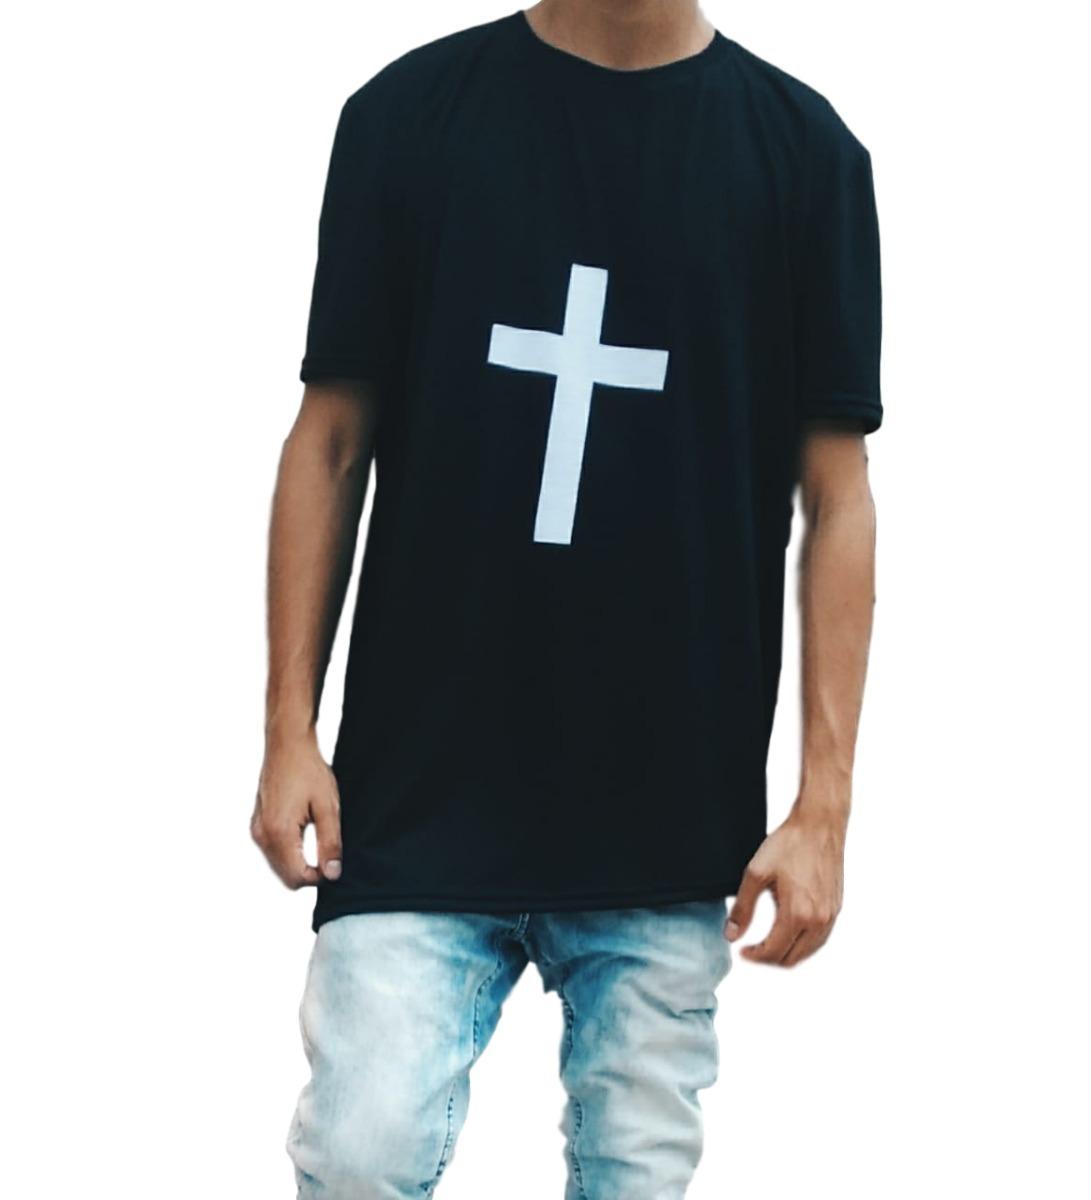 b3a861b01 camiseta masculina swag longline camisa blusa oversized. Carregando zoom.